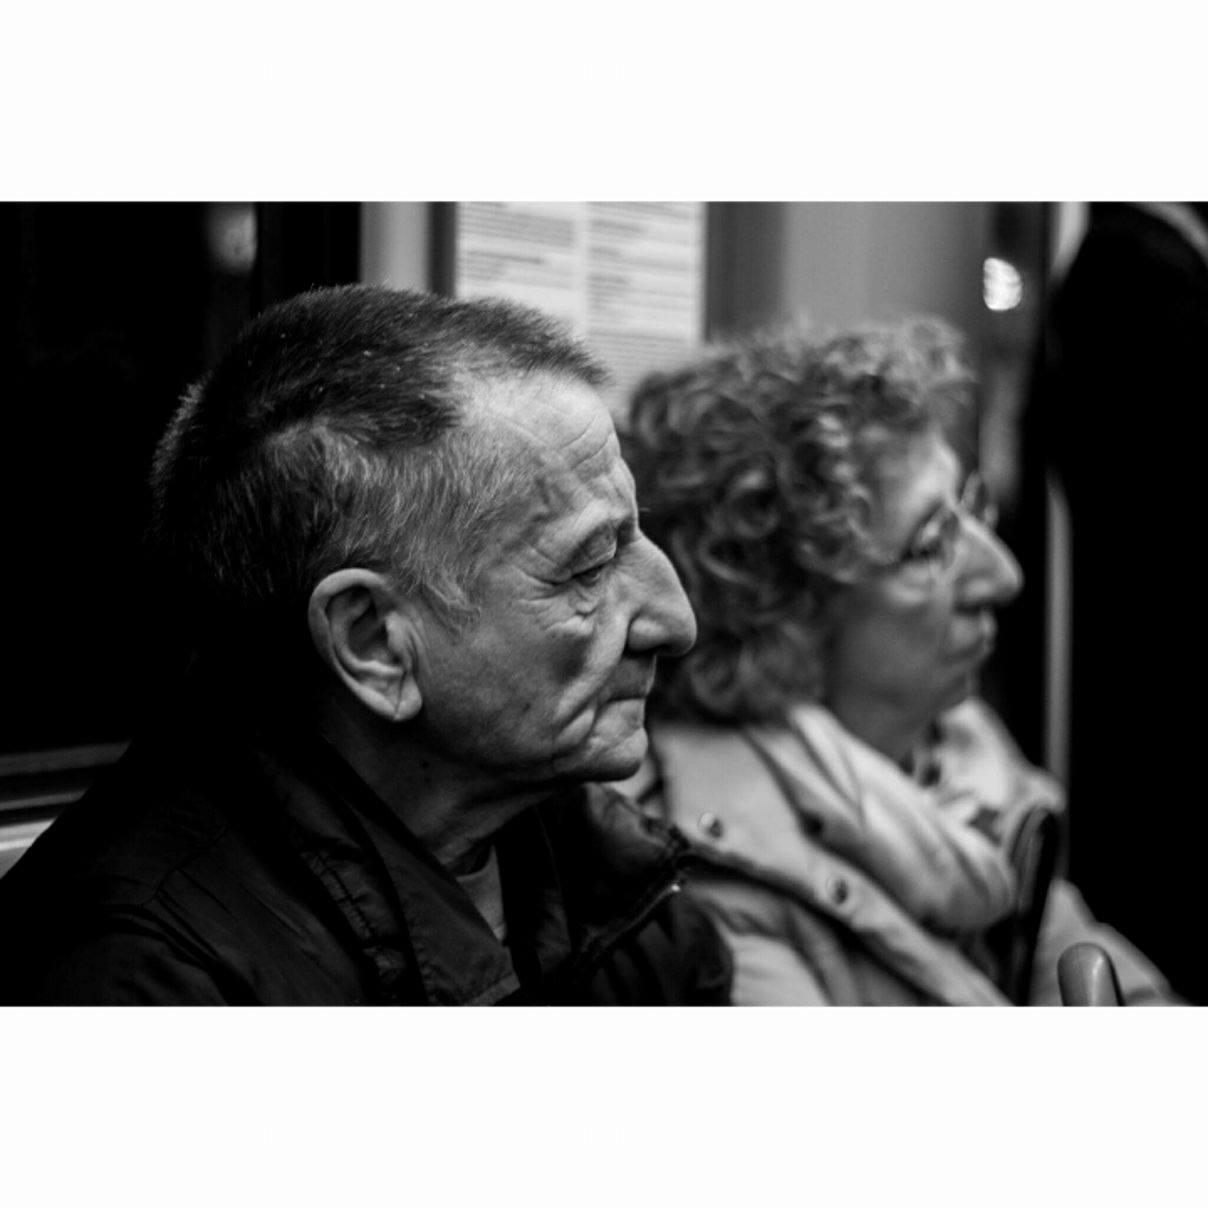 Commuters, Milan - December 2016